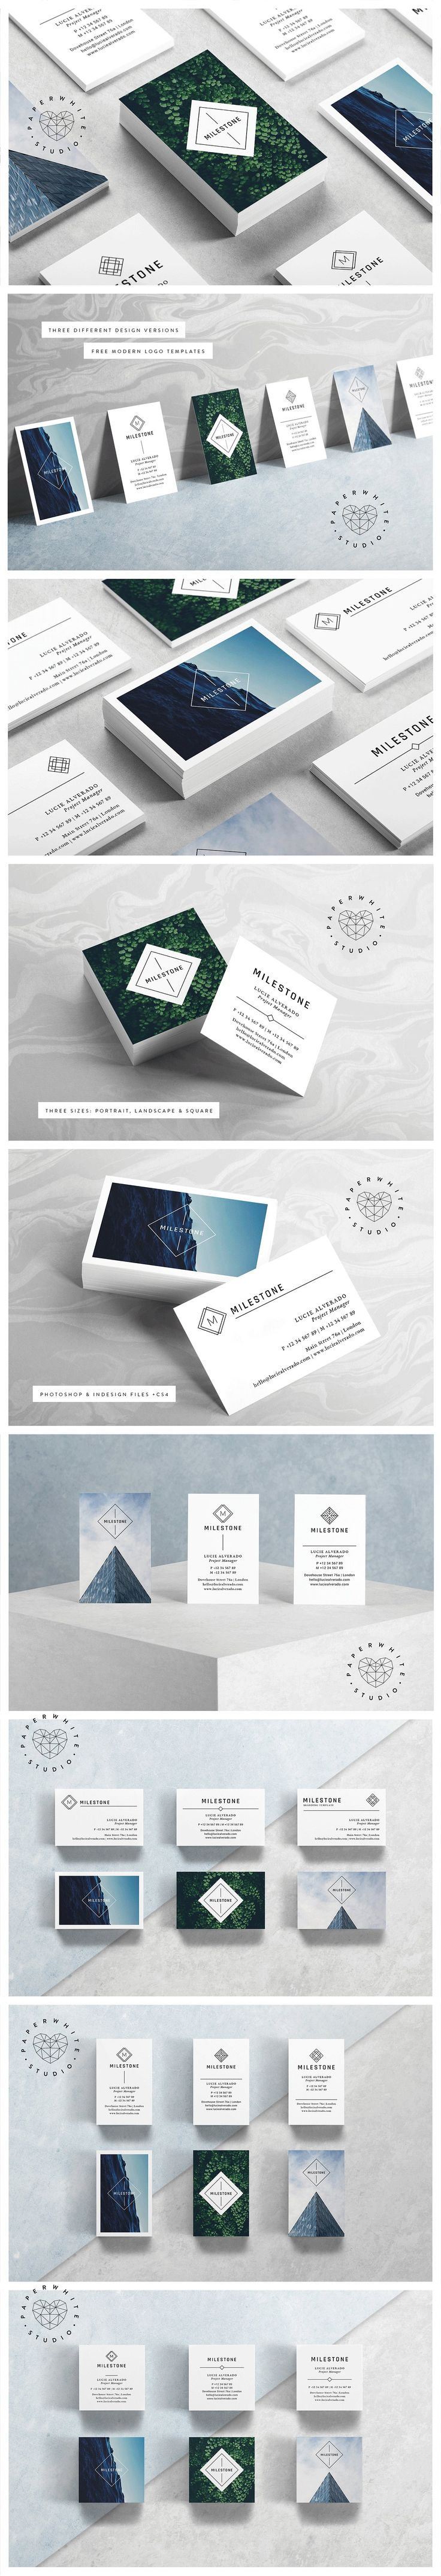 MILESTONE Business Cards by Paperwhite Studio